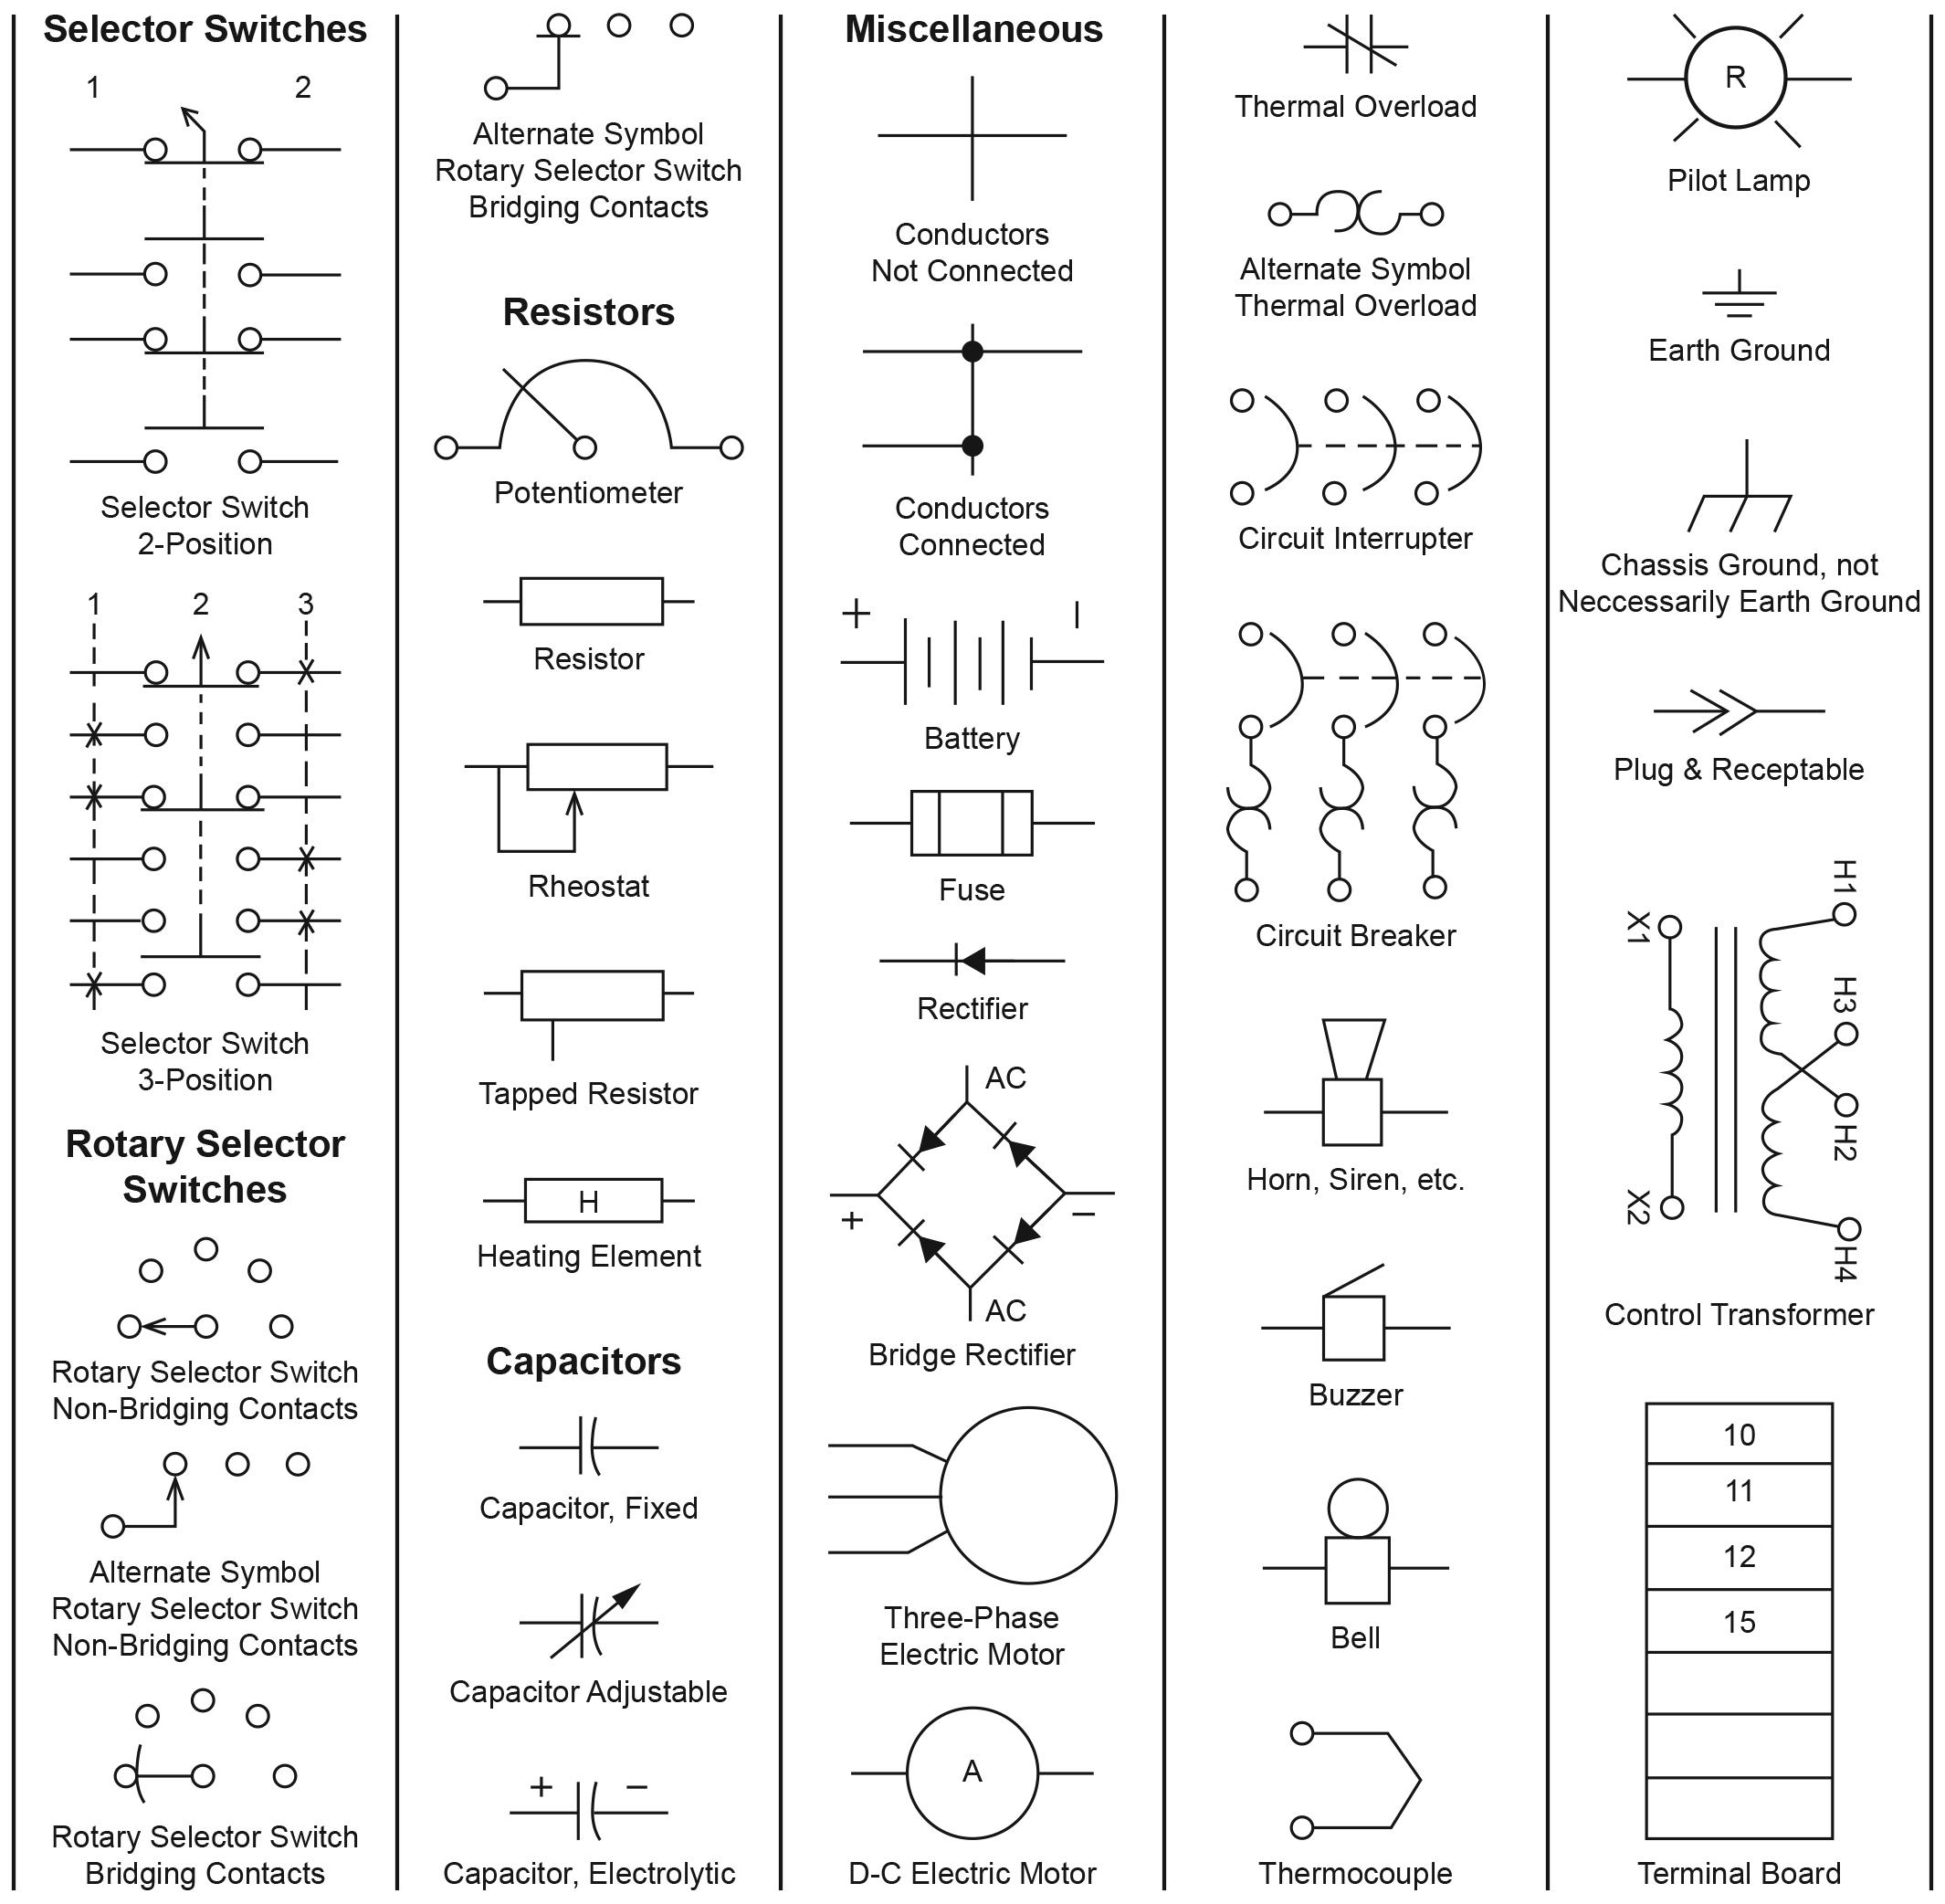 electrical wiring diagram symbols 1981 yamaha 450 switch symbol library